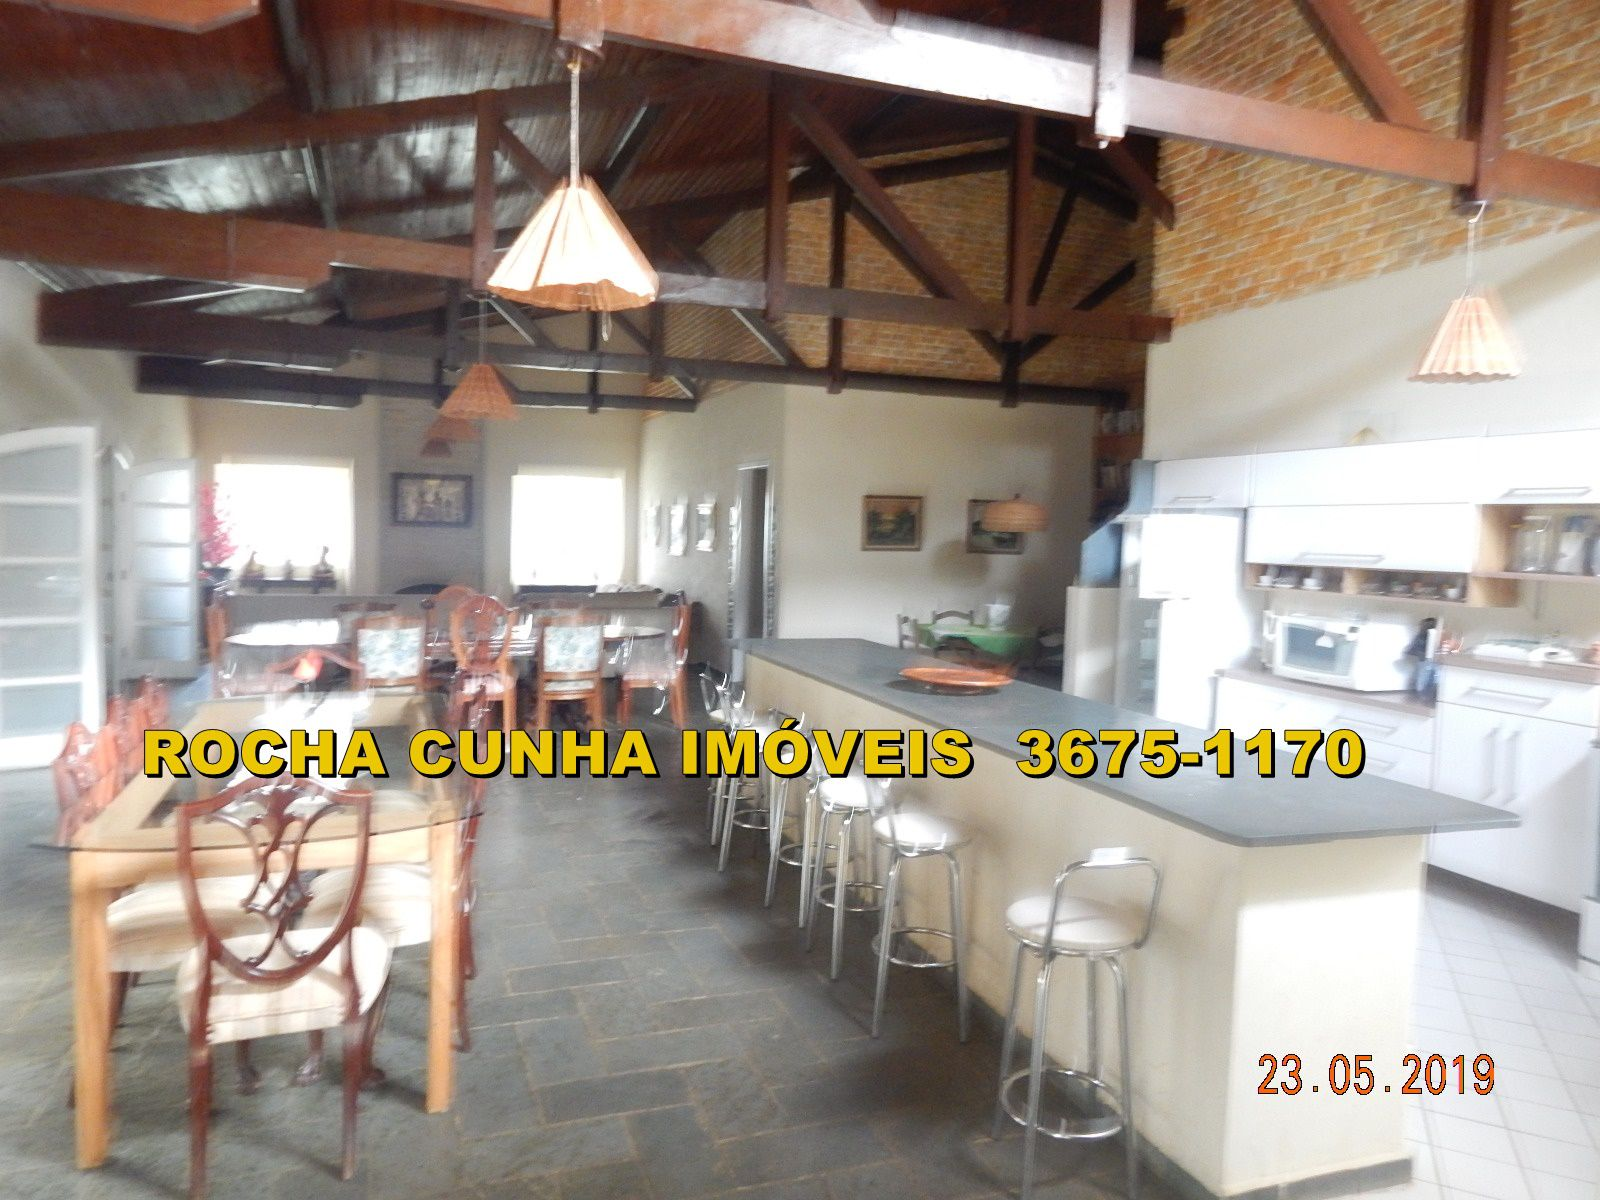 Chácara à venda Santana de Parnaíba,SP - R$ 780.000 - CHACARA0010 - 18